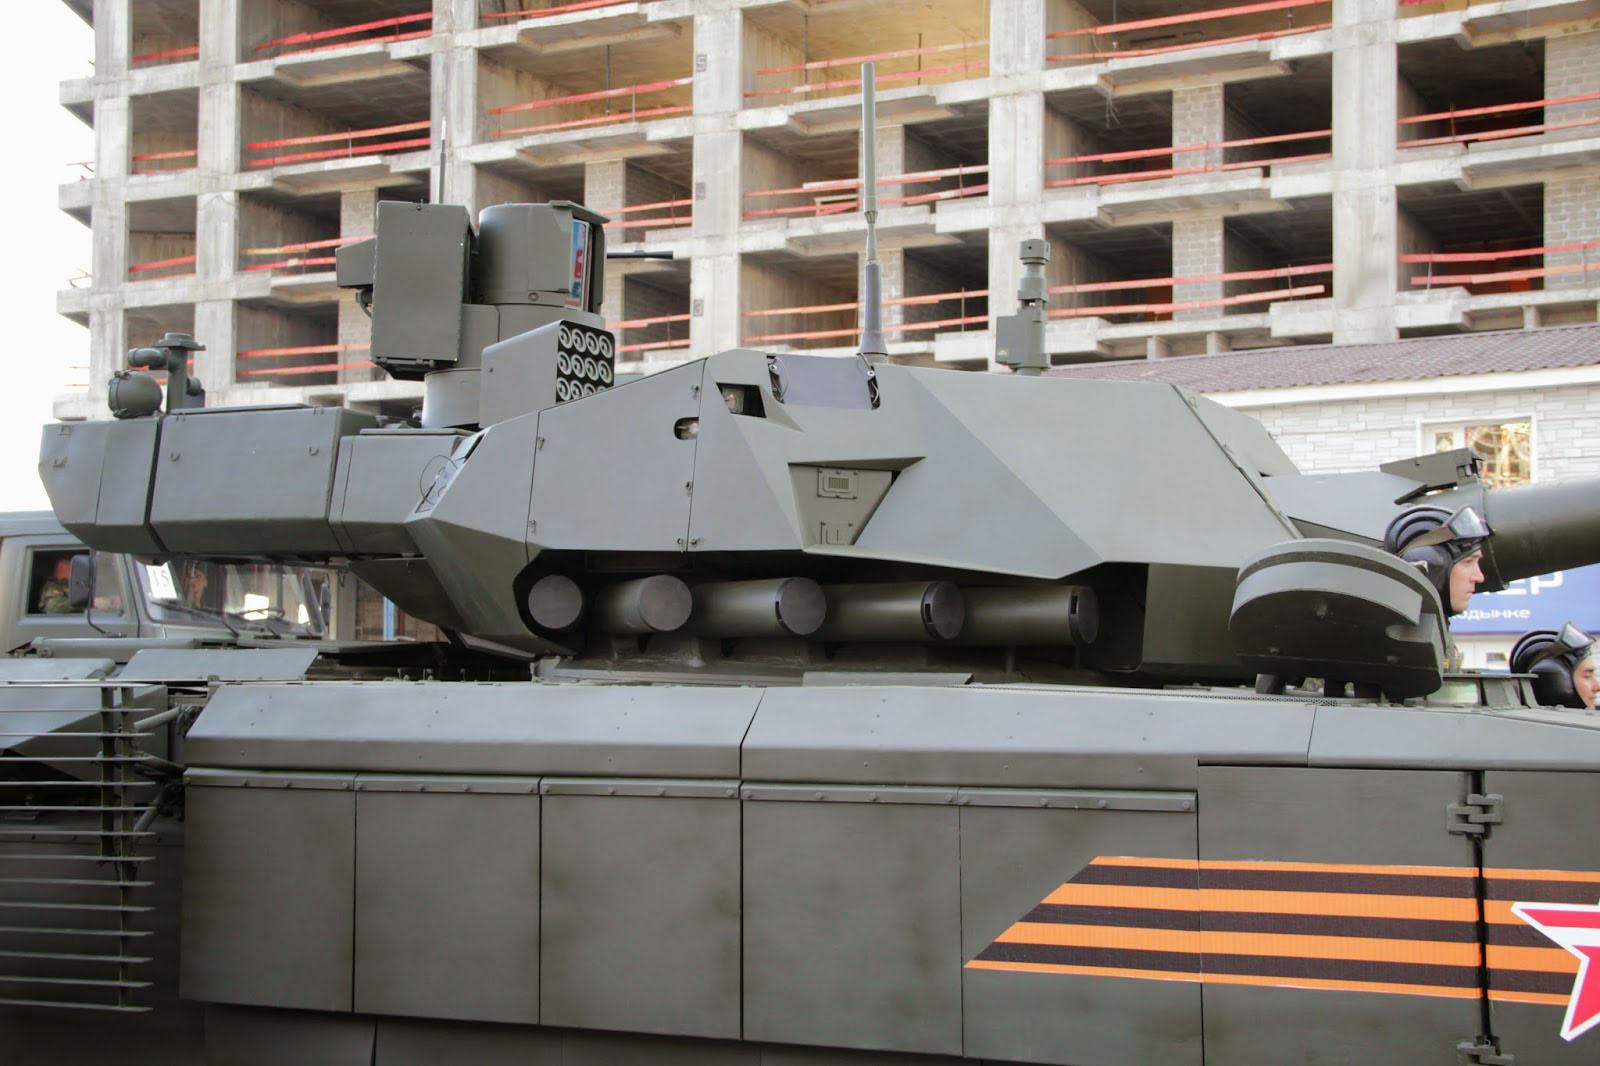 Armata: ¿el robotanque ruso? - Página 2 0_131ac6_243d4dc0_orig